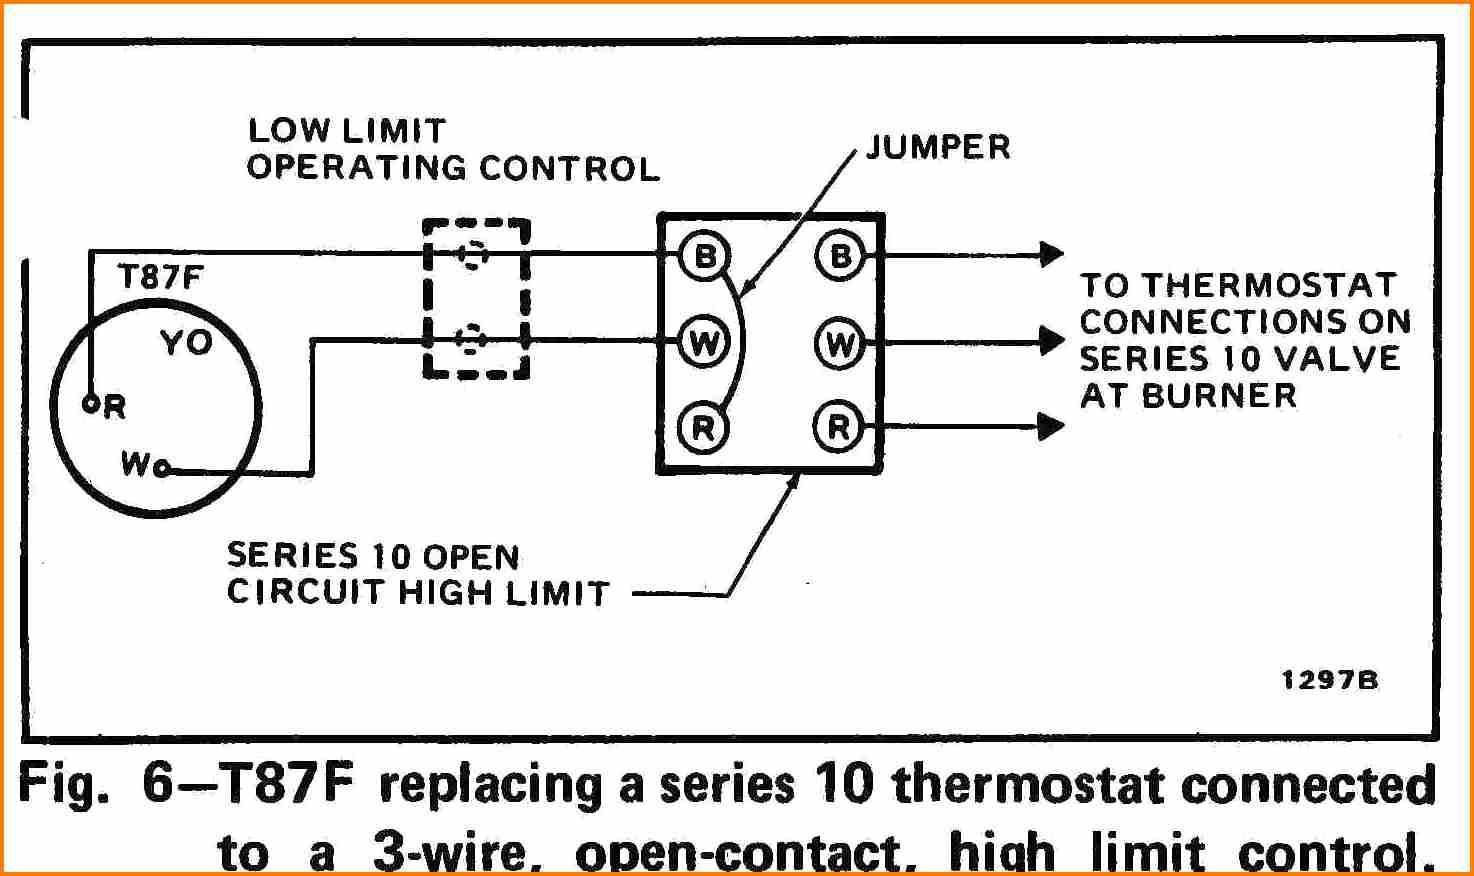 Evaporative Cooler Thermostat Wiring Diagram | Wiring Library - Swamp Cooler Wiring Diagram